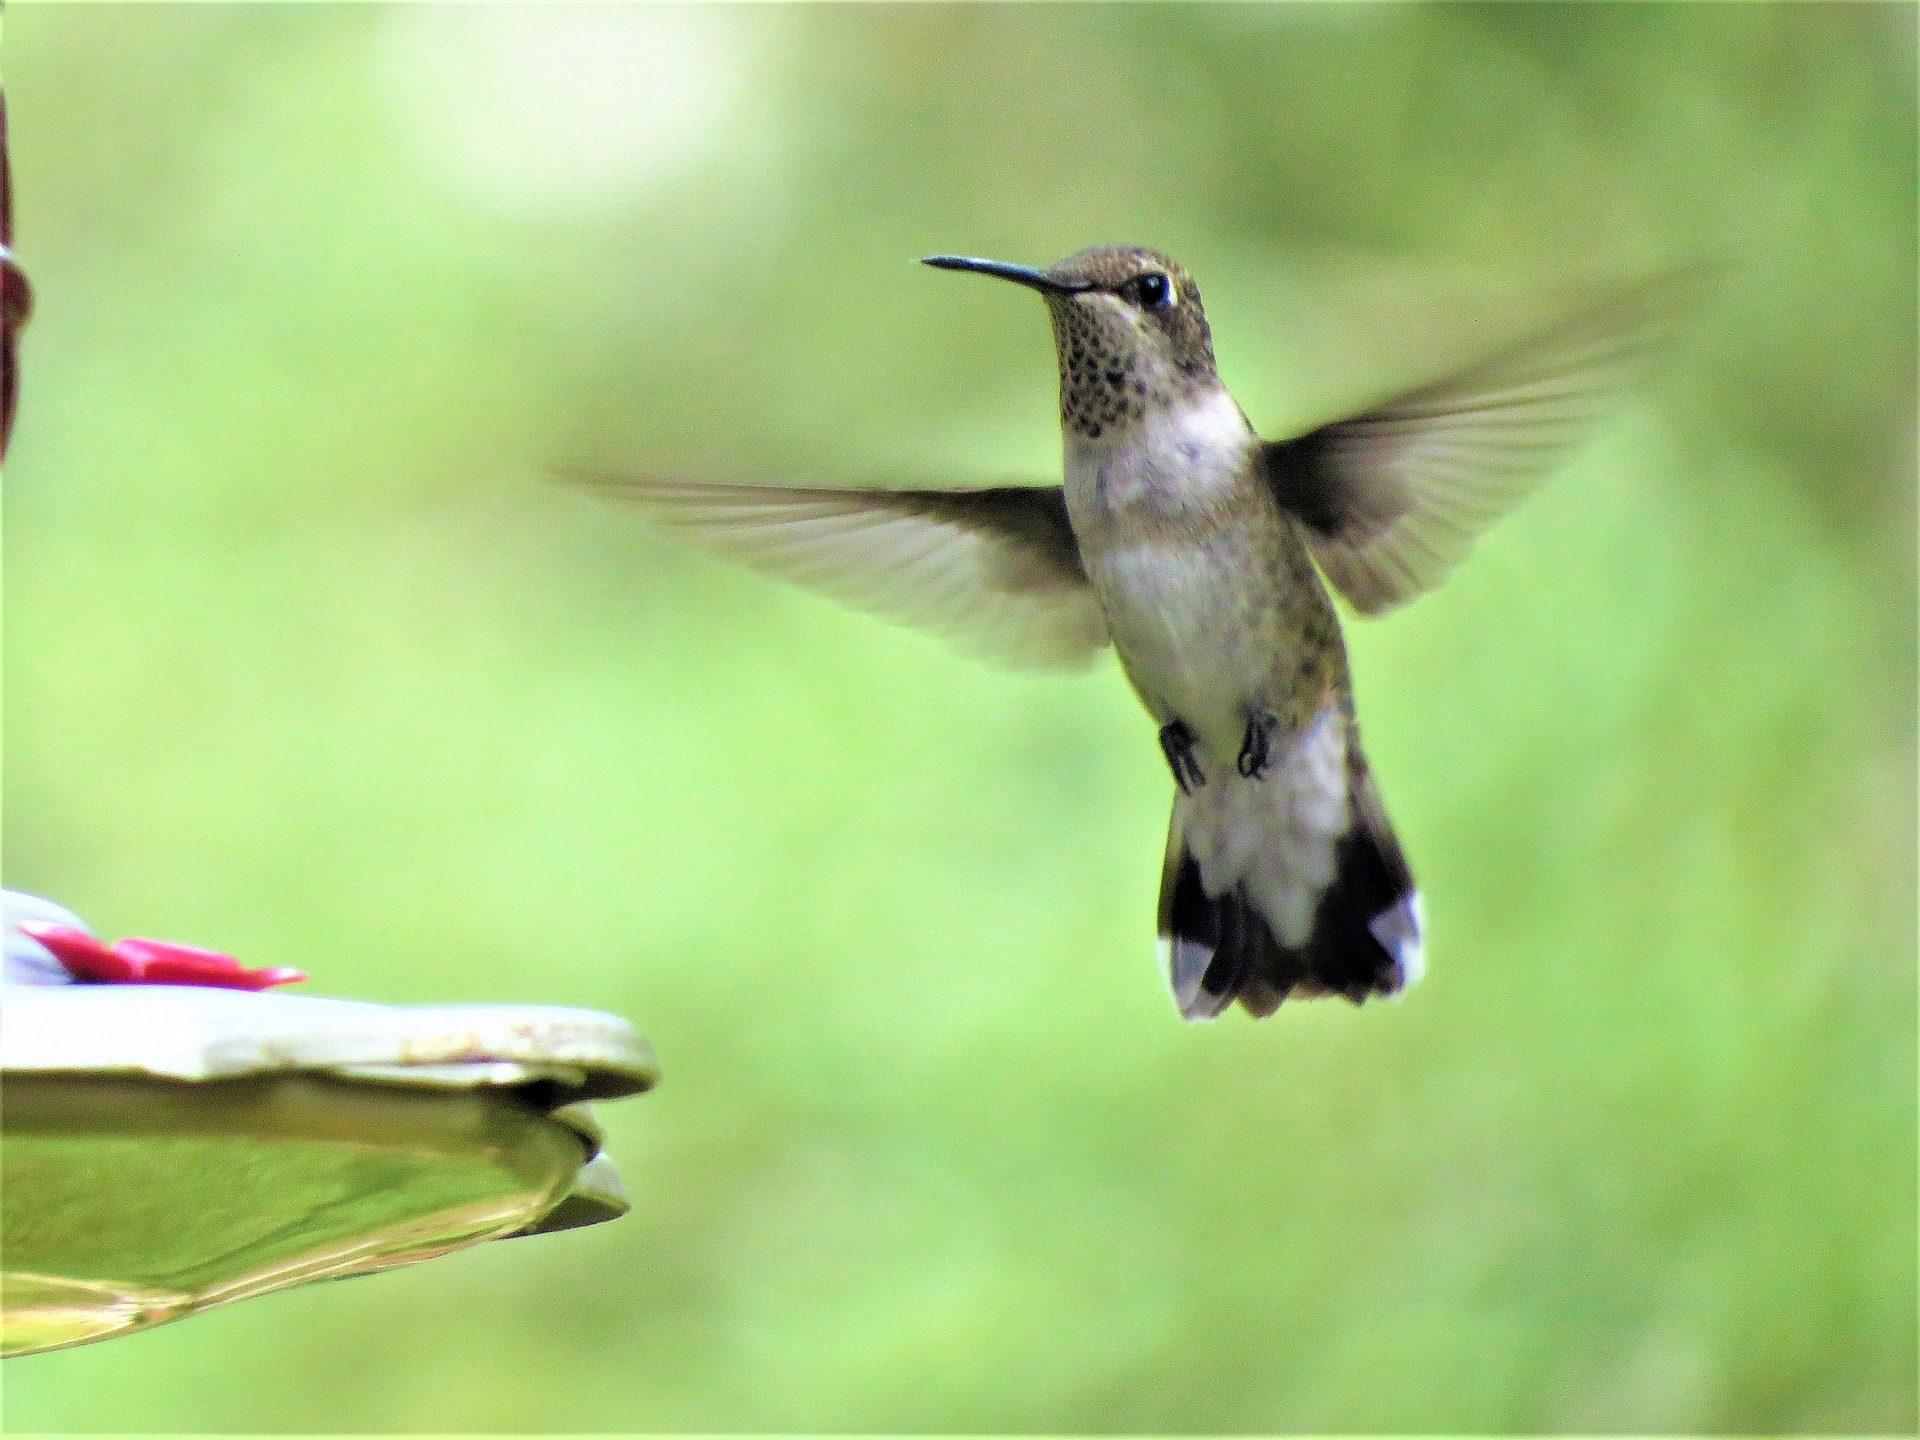 colibrí, पक्षी, Ave, aleteo, उड़ान, गति, पीक - HD वॉलपेपर - प्रोफेसर-falken.com